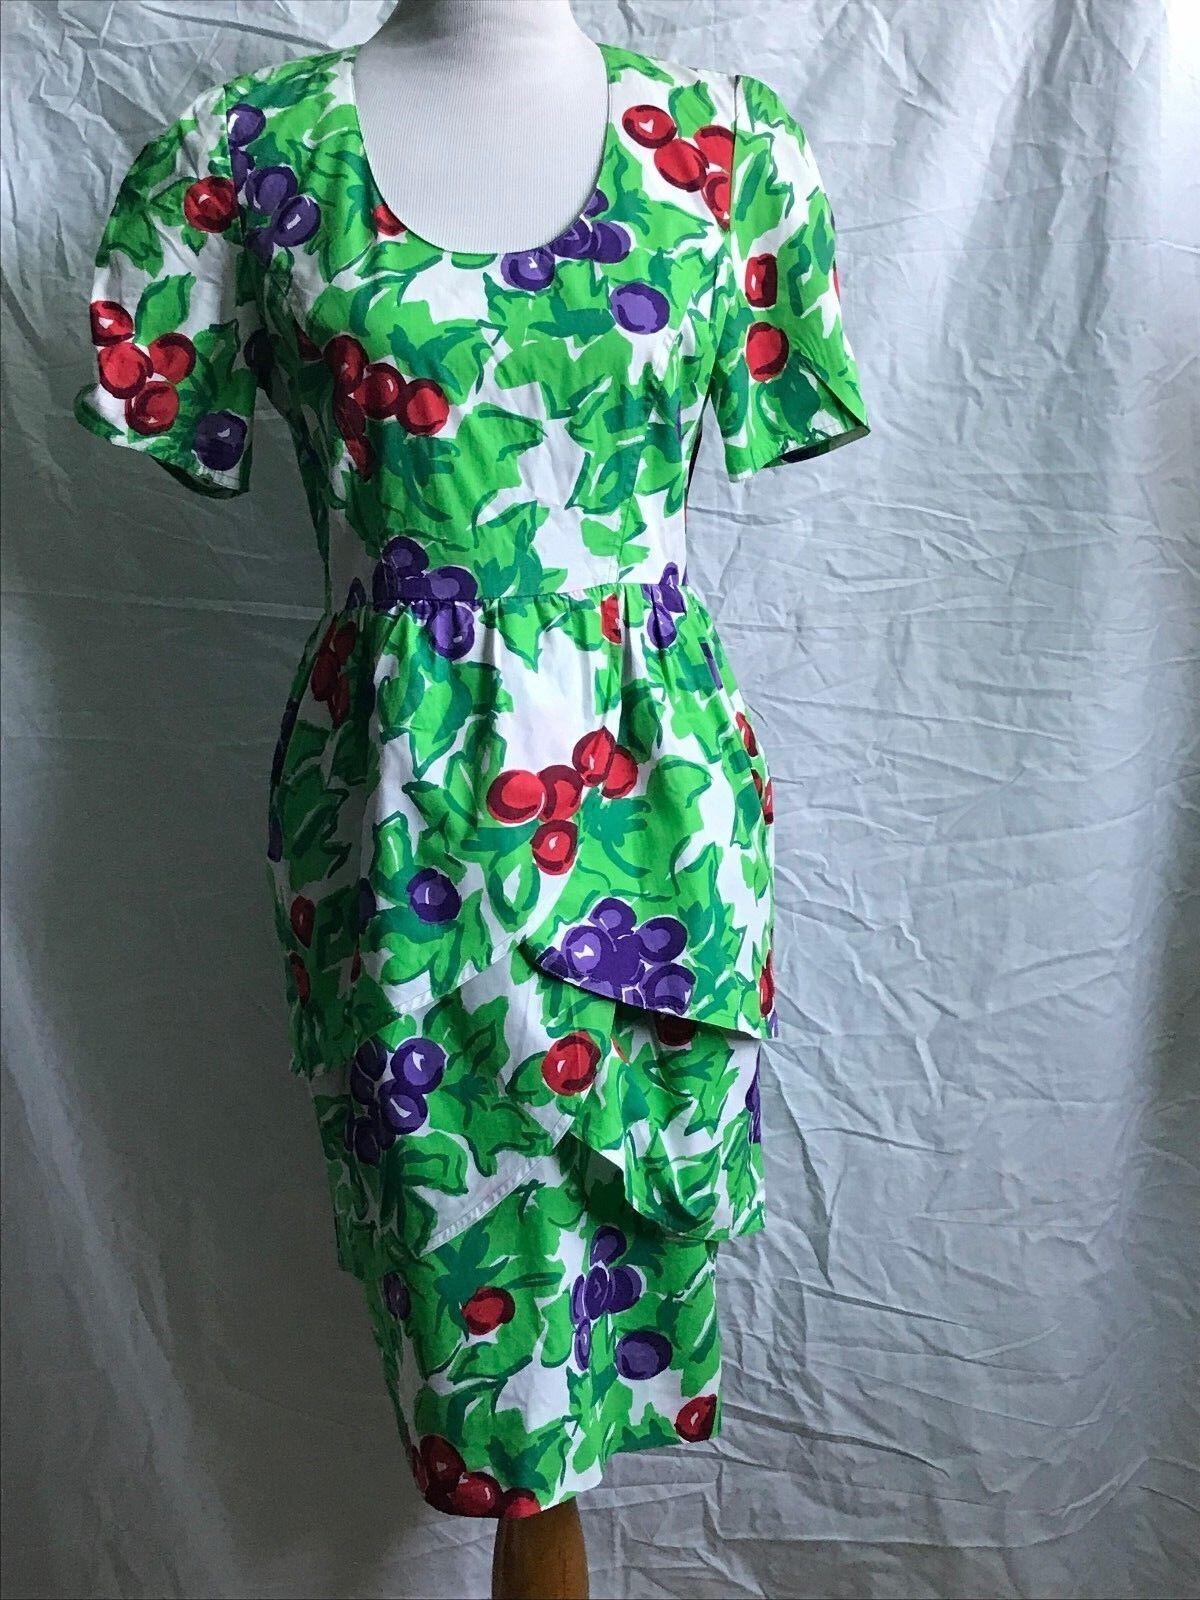 VINTAGE Guy Laroche Boutique PARIS Tulip Skirt Tiered Dress Berry Print 8 10